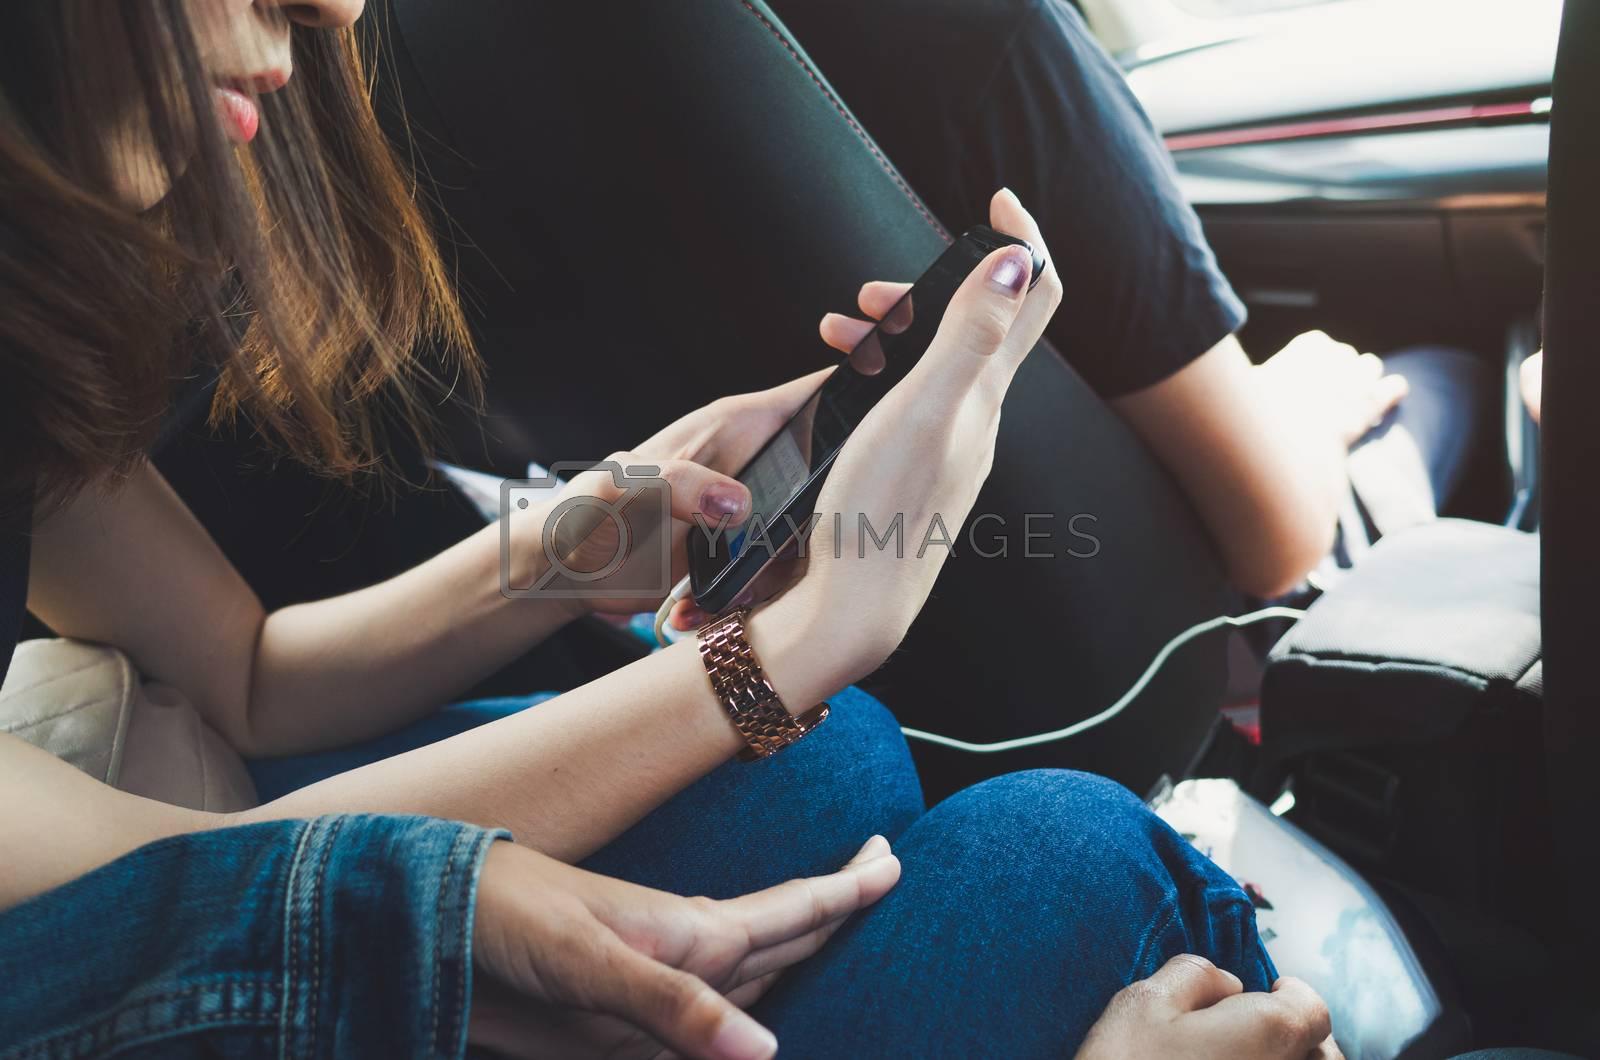 Women using phone in the car.